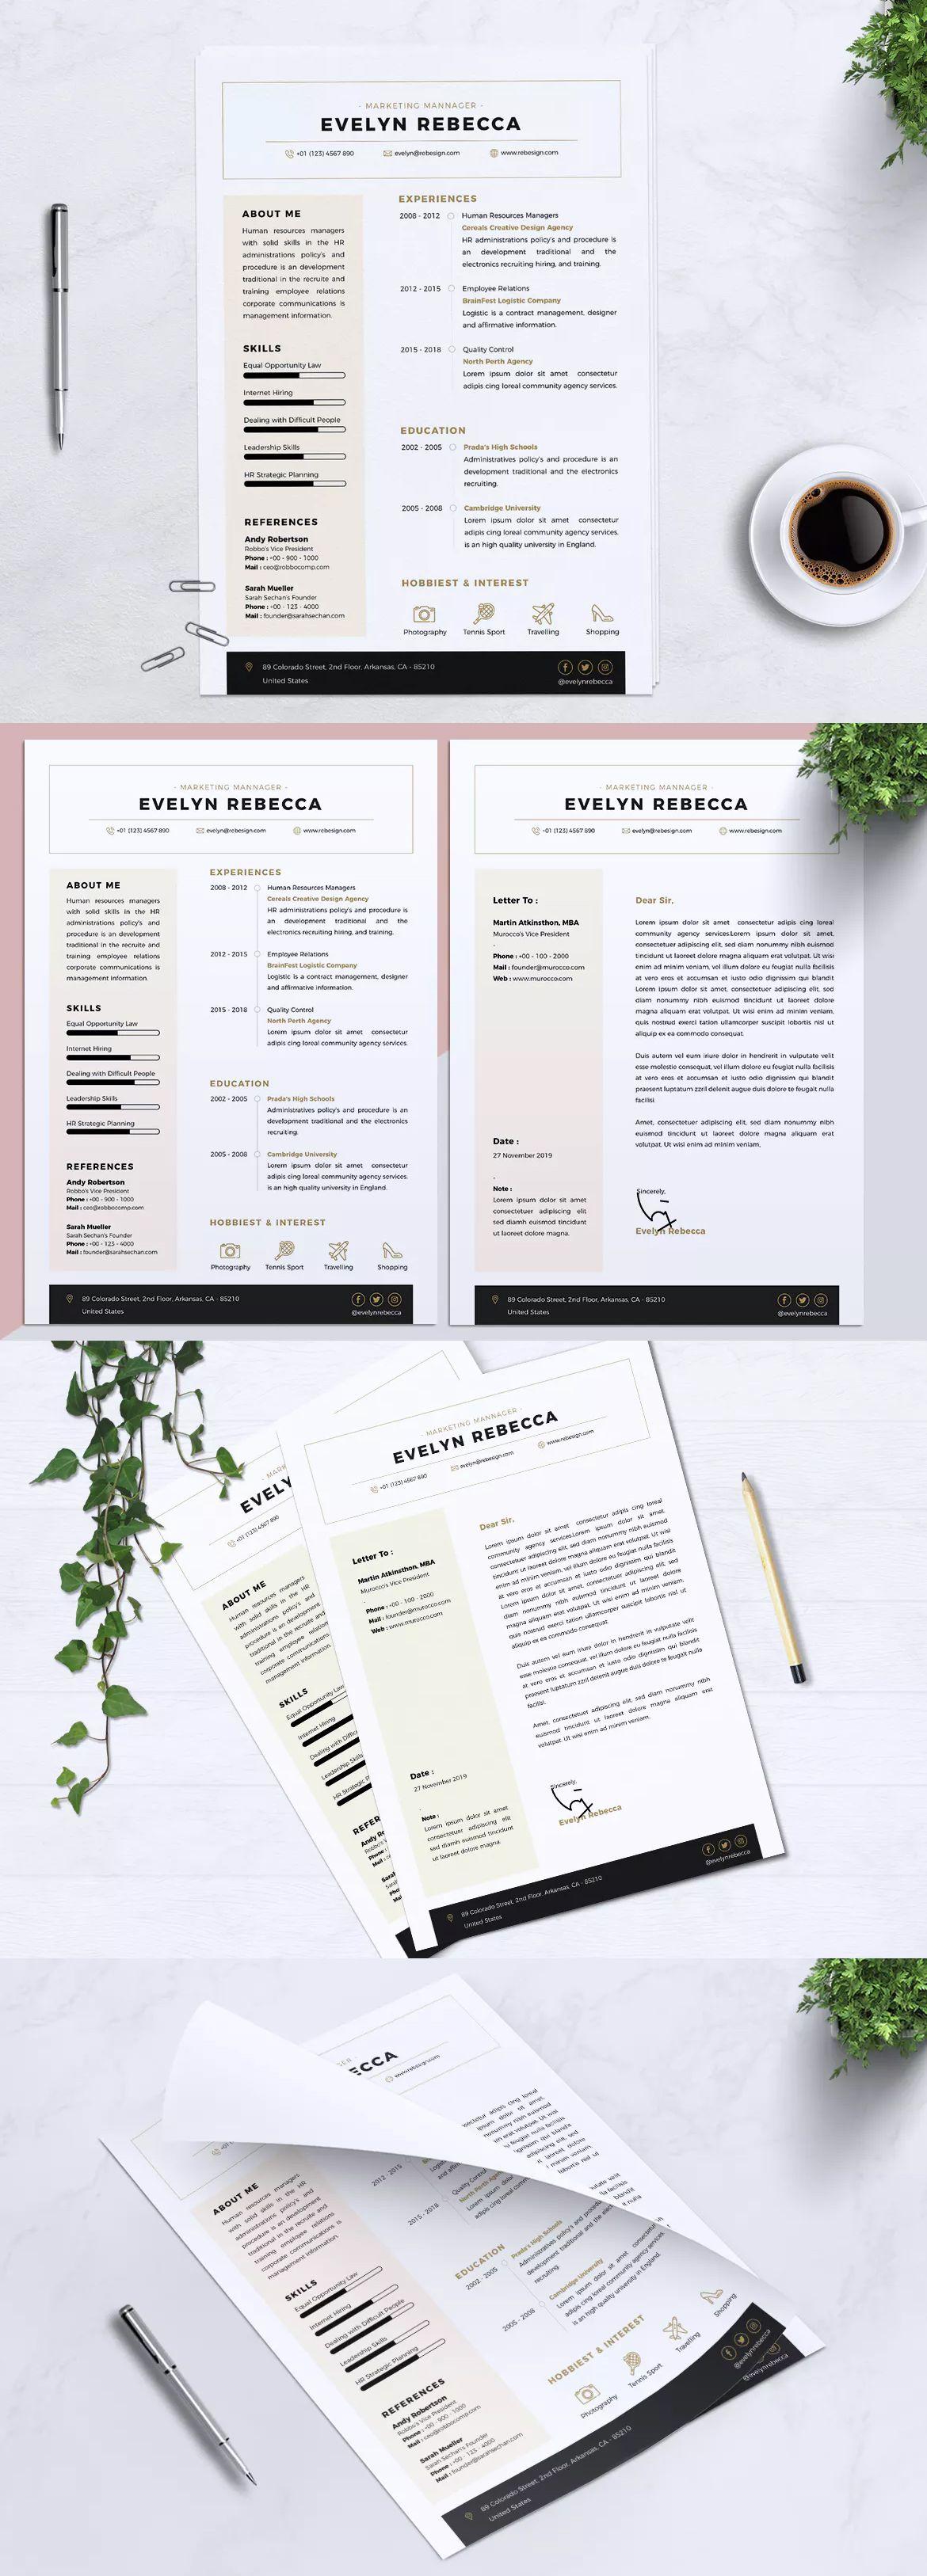 Minimalist CV Resume Vol. 33 by RahardiCreative on Cv